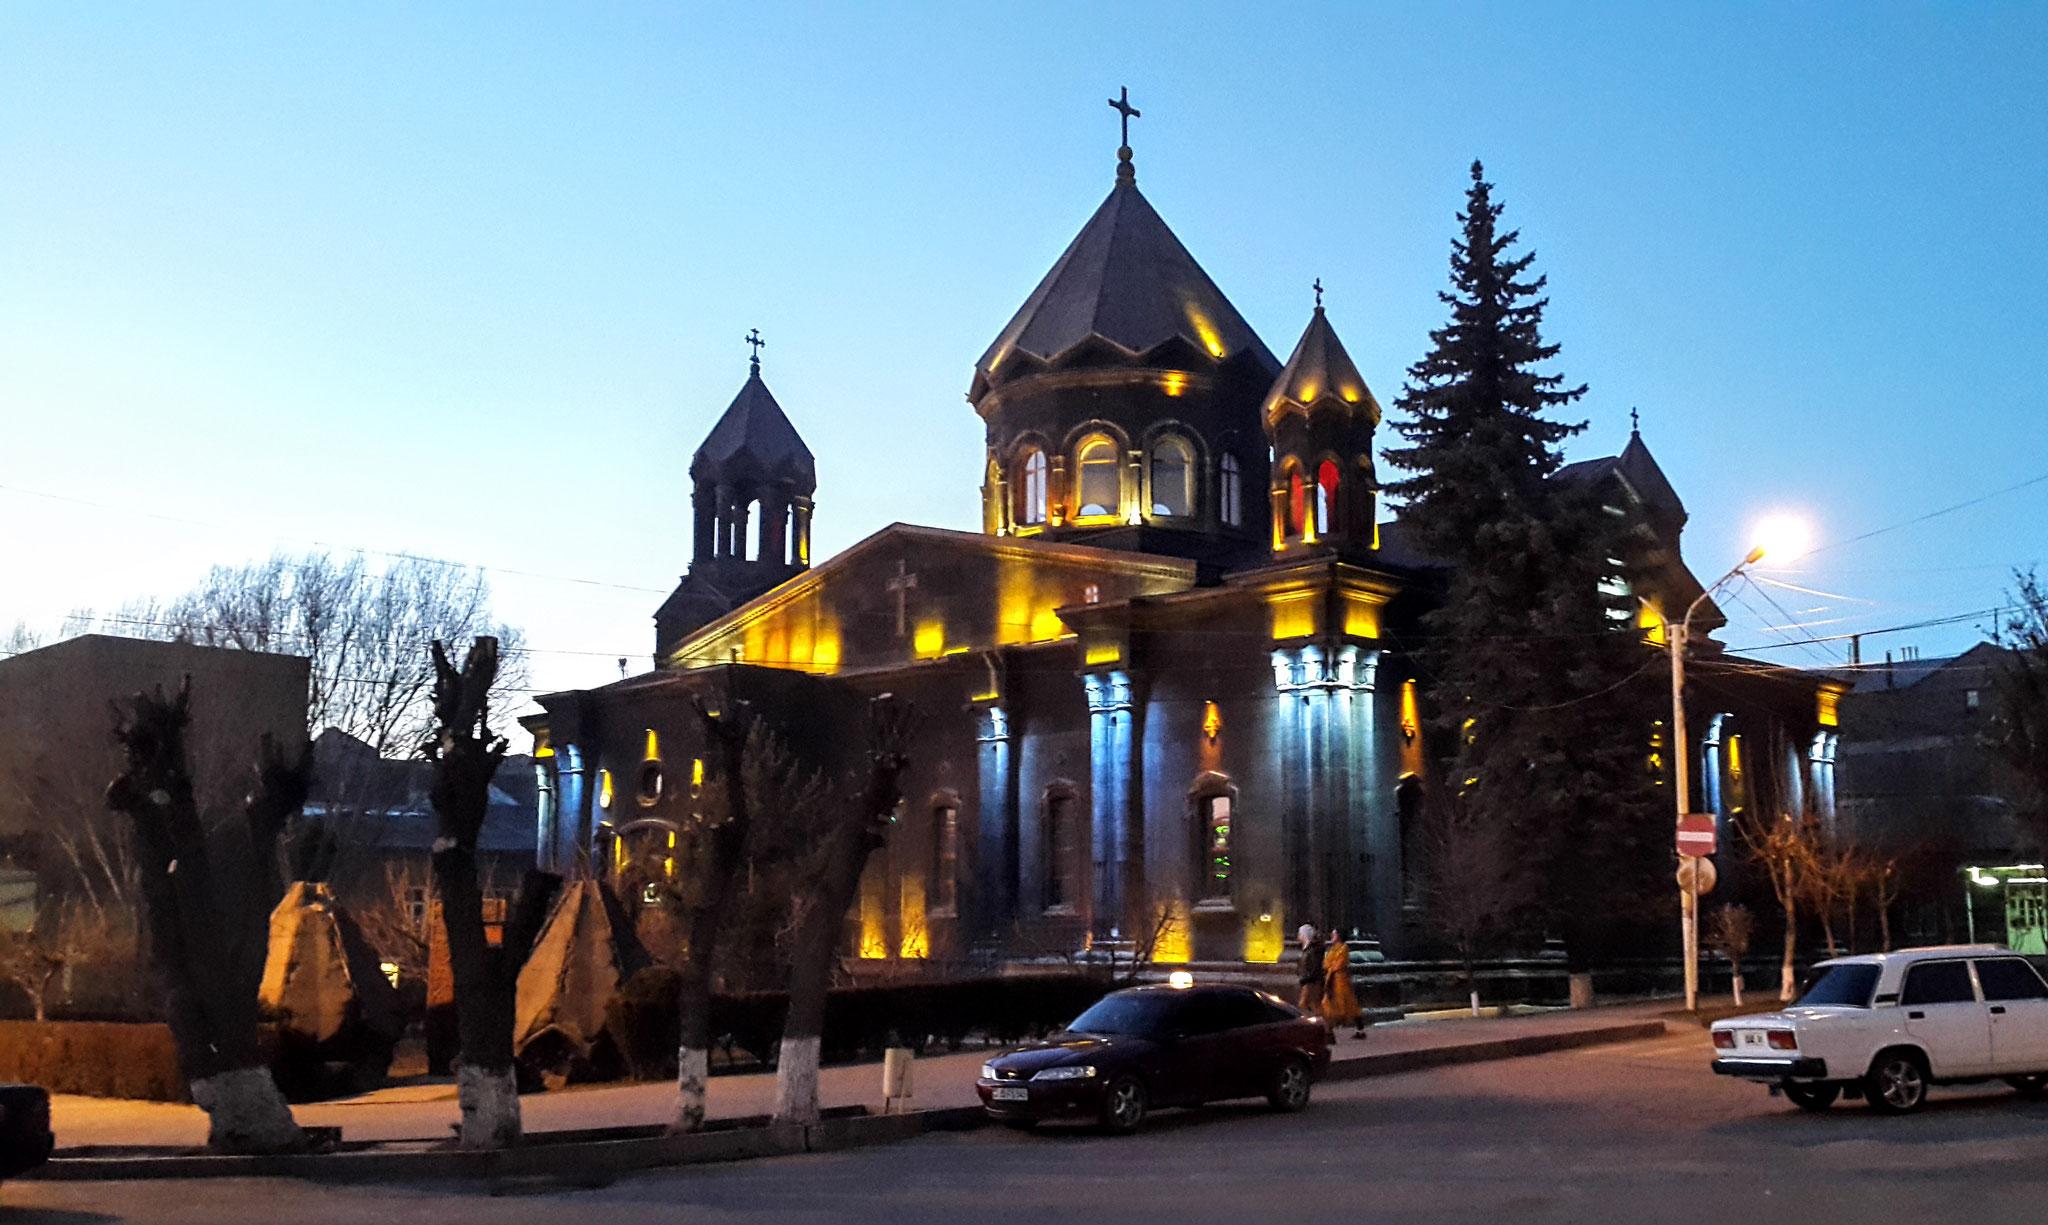 Hl. Yot Verk Kirche am Abend